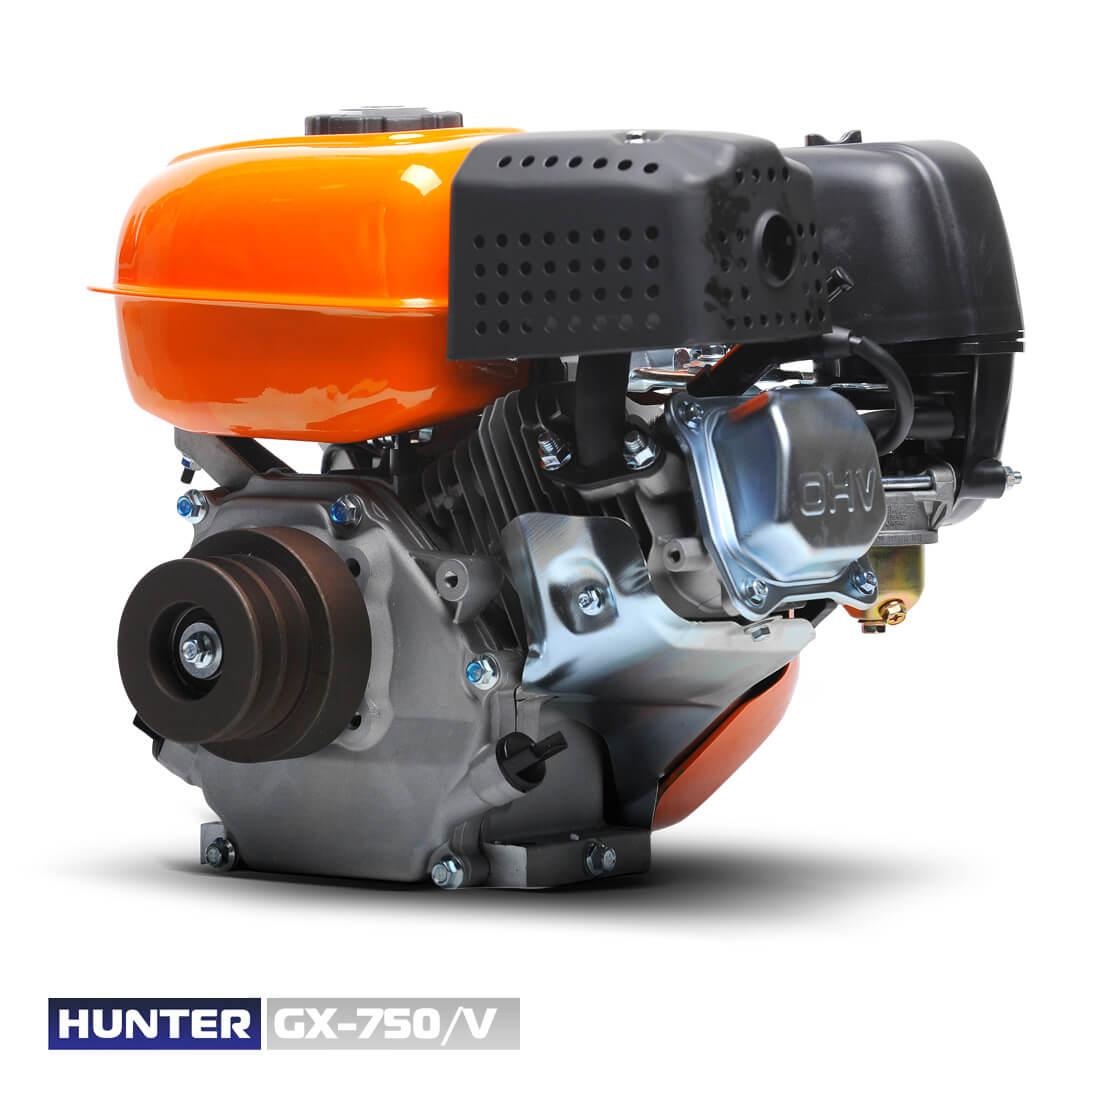 Фото GX-750/V цена 5000грн №4 — Hunter